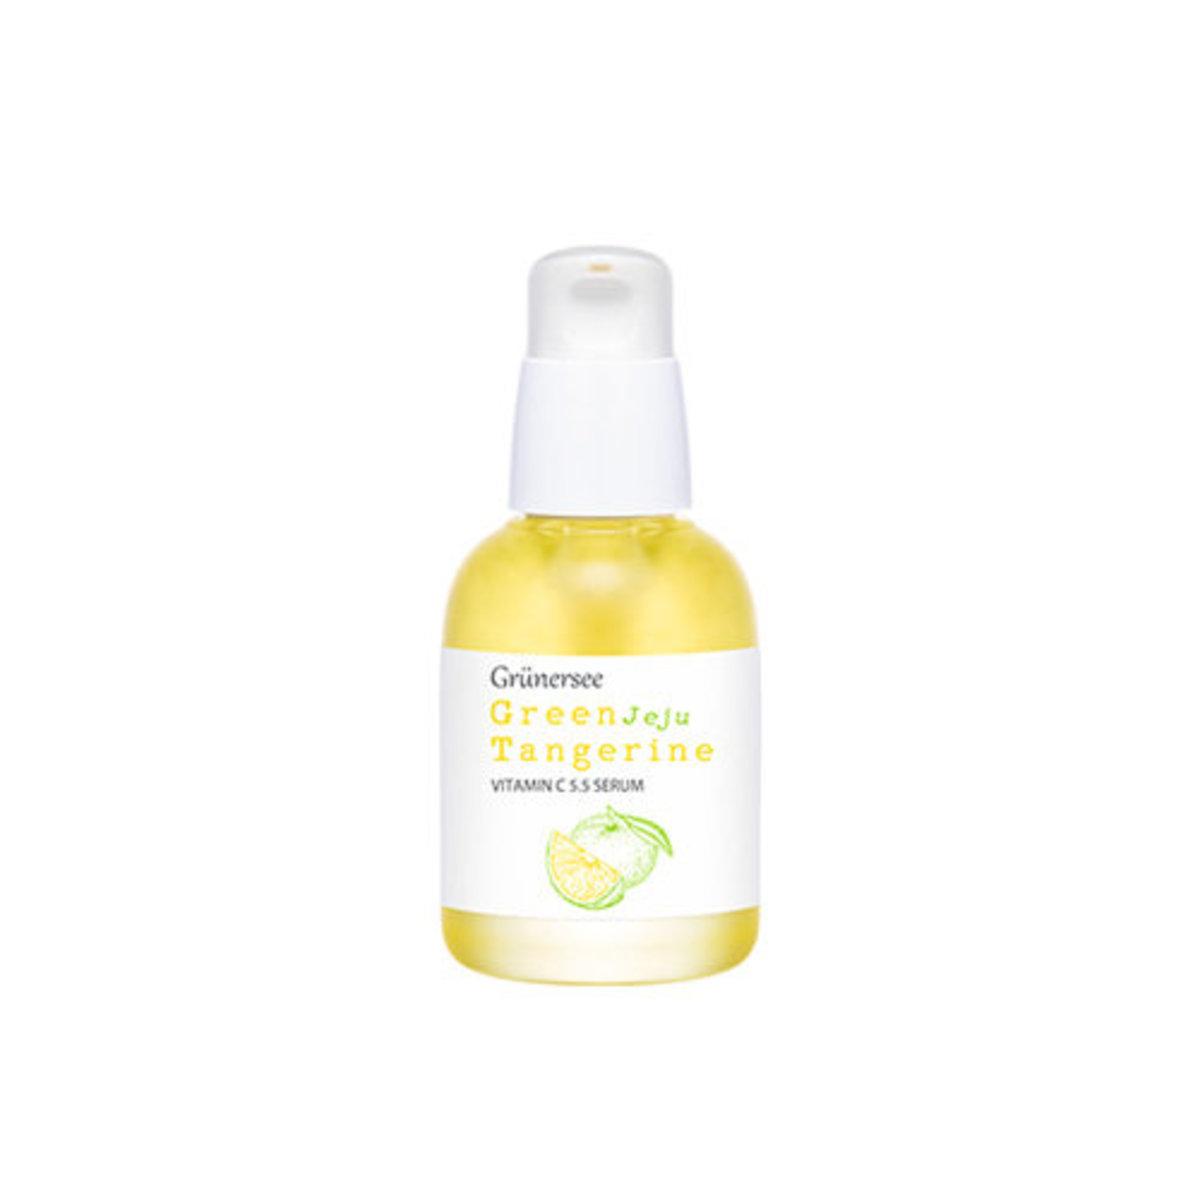 Green Jeju Tangerine Vitamin C 5.5 Serum